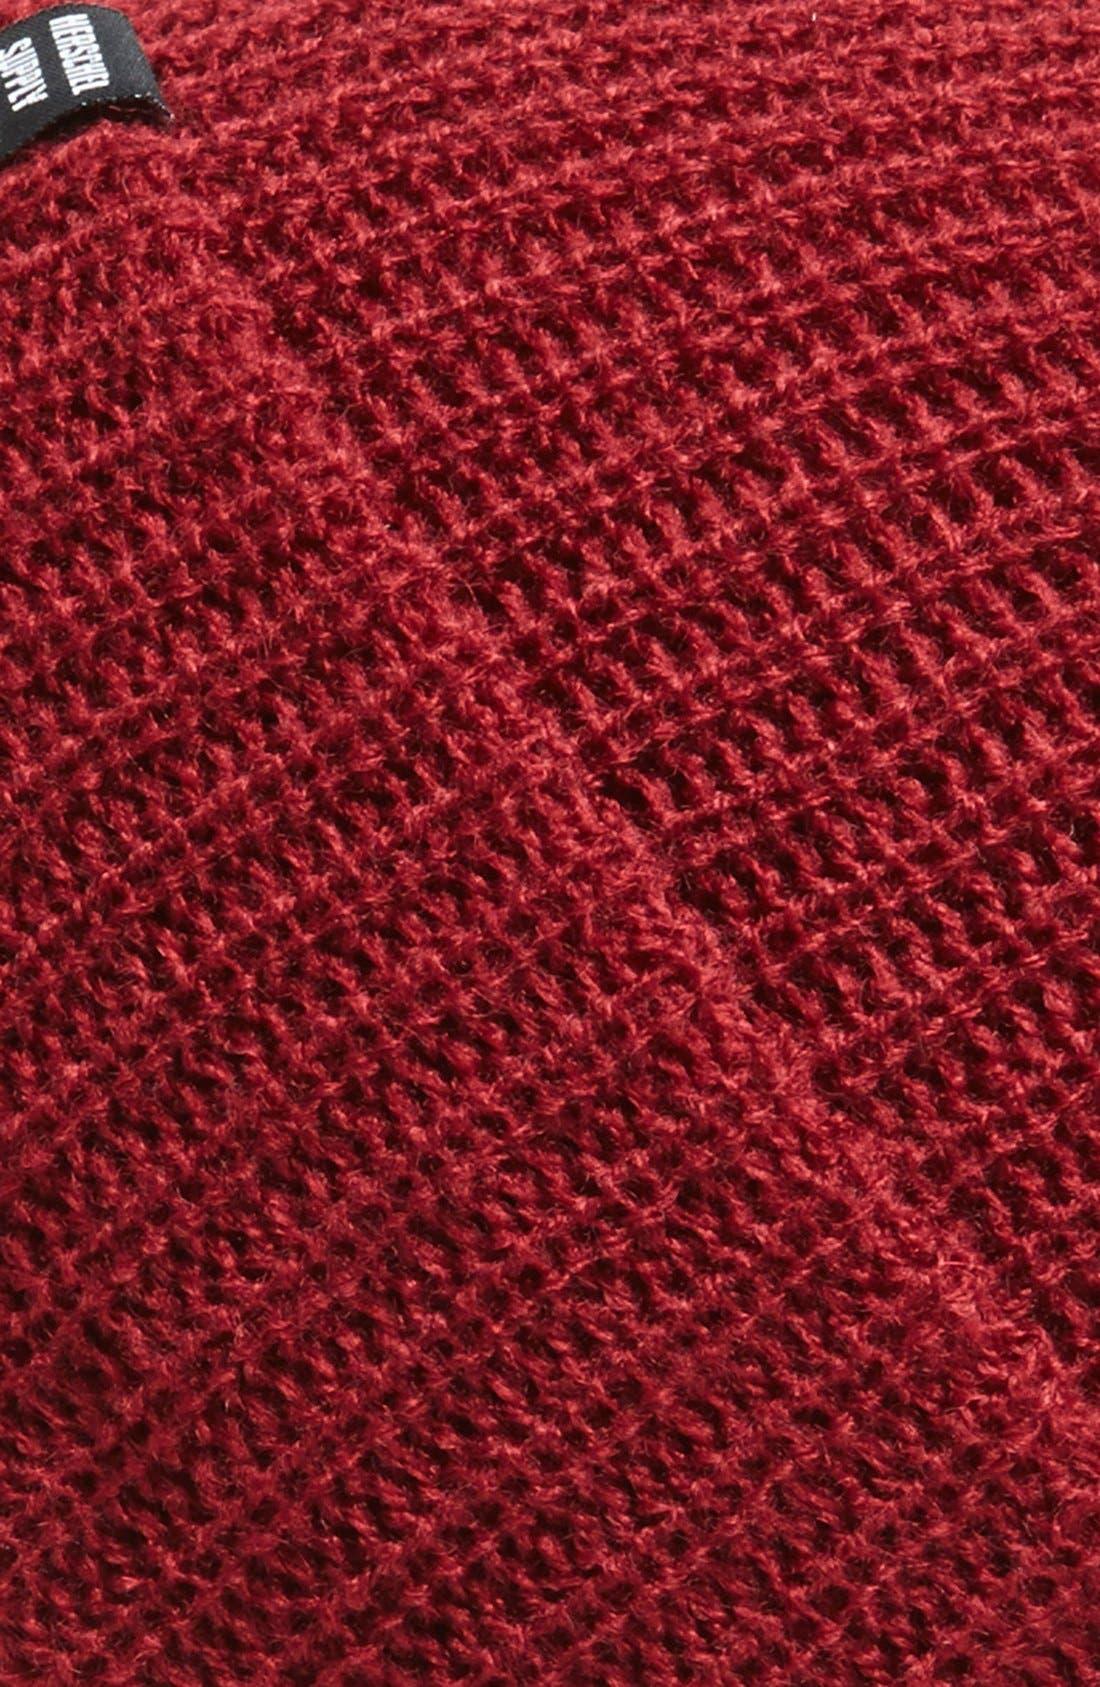 'Quartz' Solid Knit Cap,                             Alternate thumbnail 16, color,